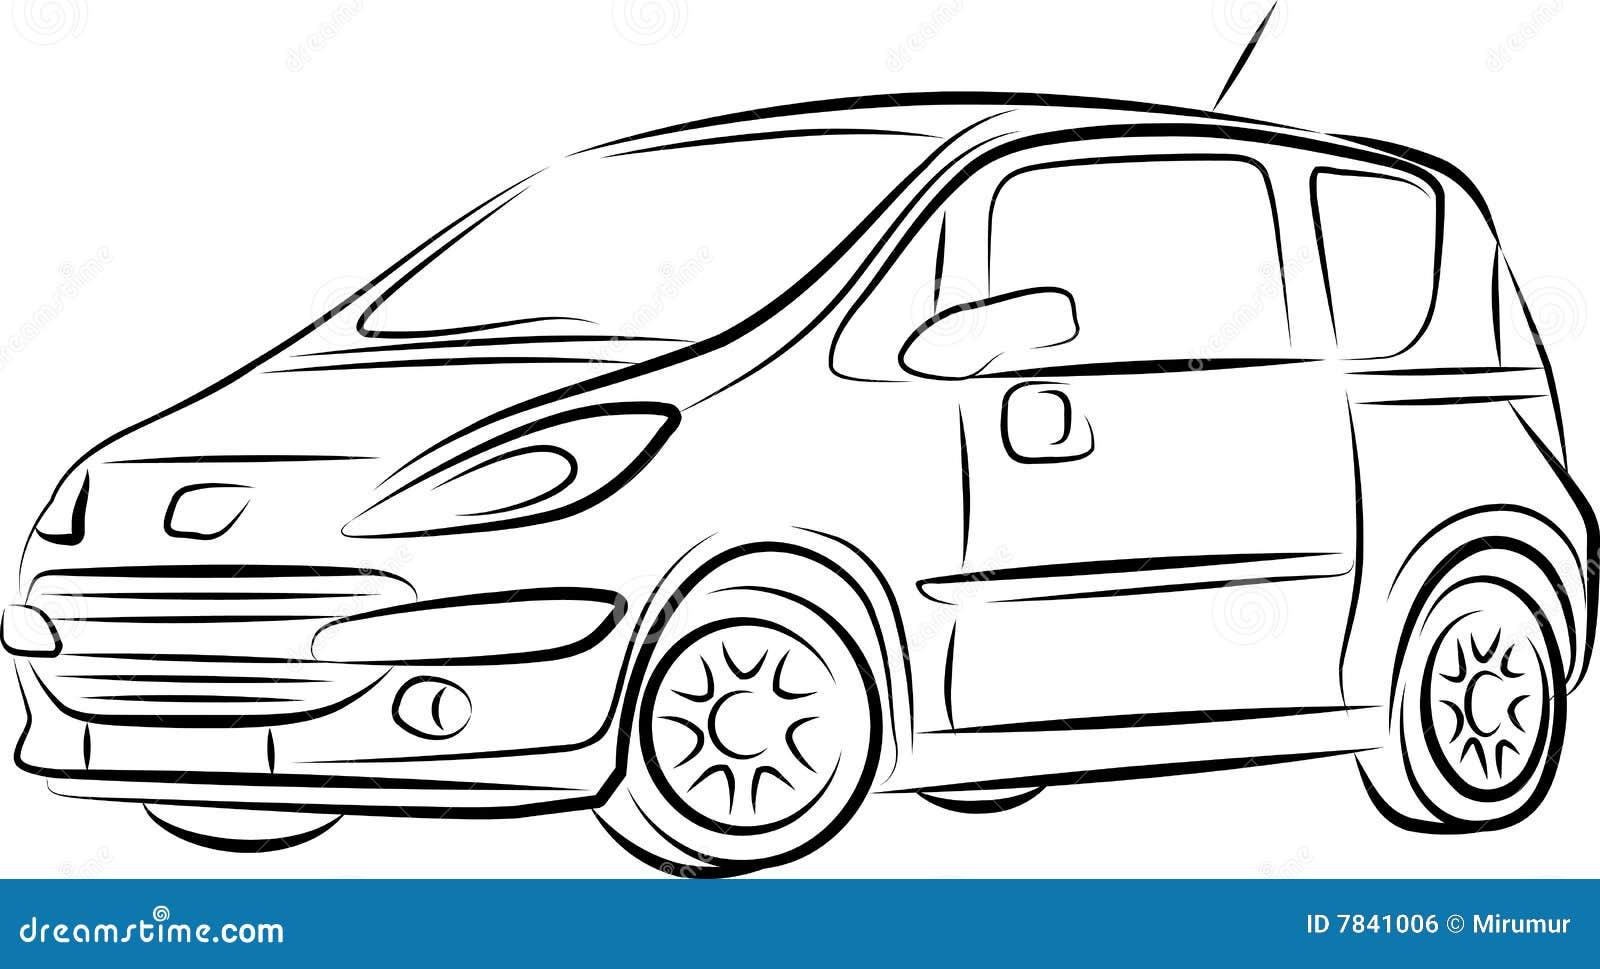 tekening de auto stock illustratie illustratie